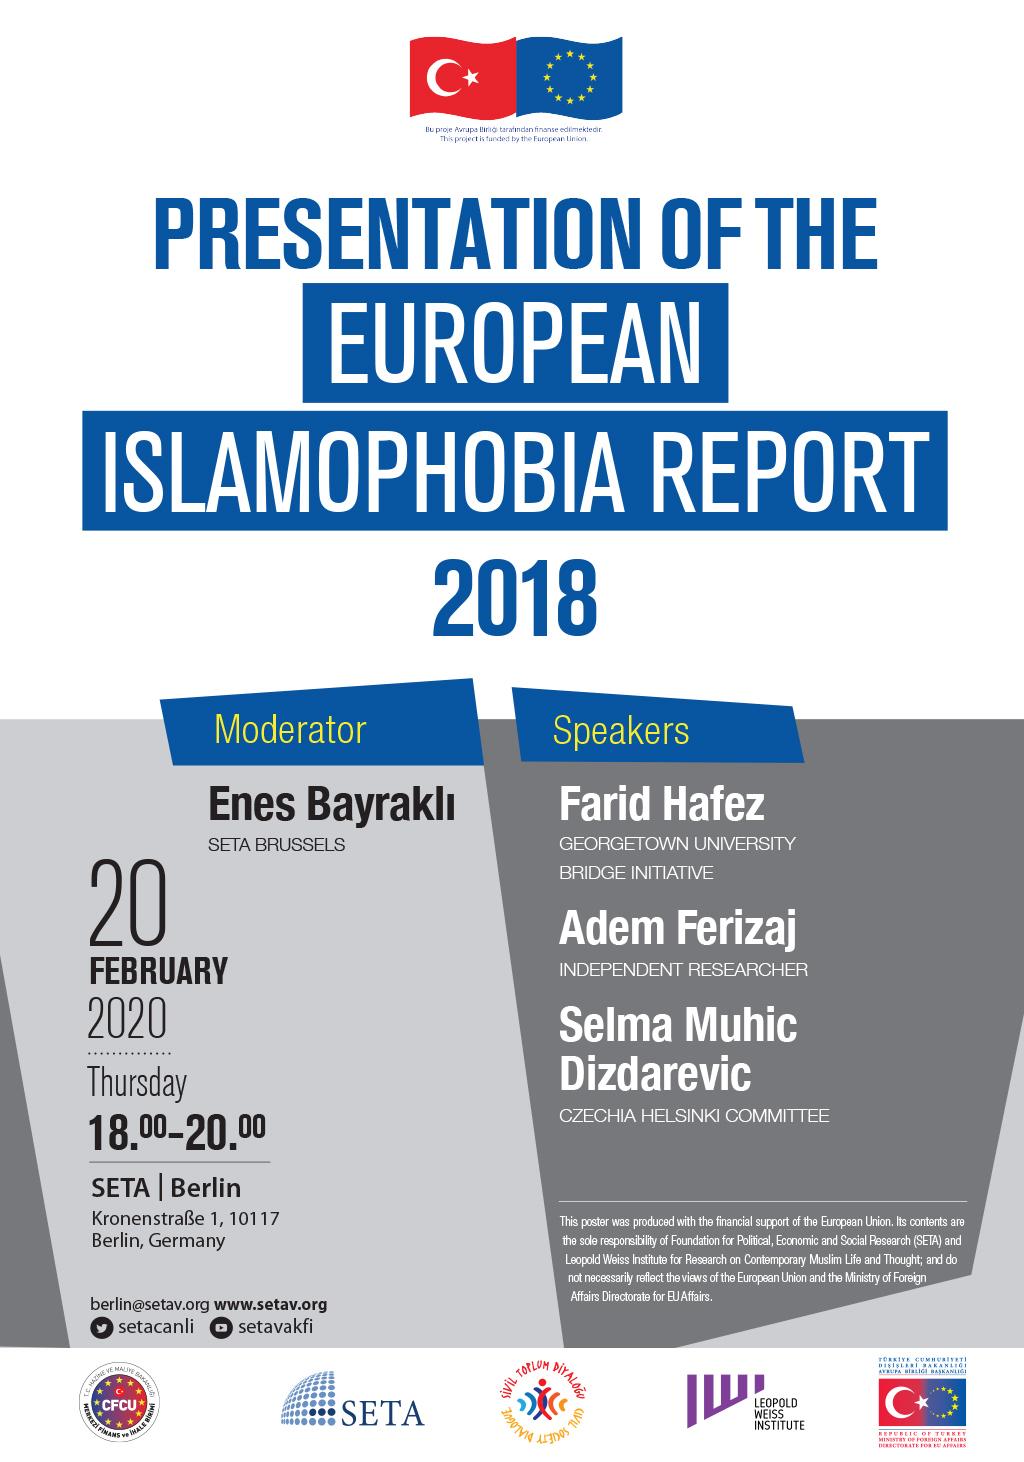 Panel: Presentation of the European Islamophobia Report 2018